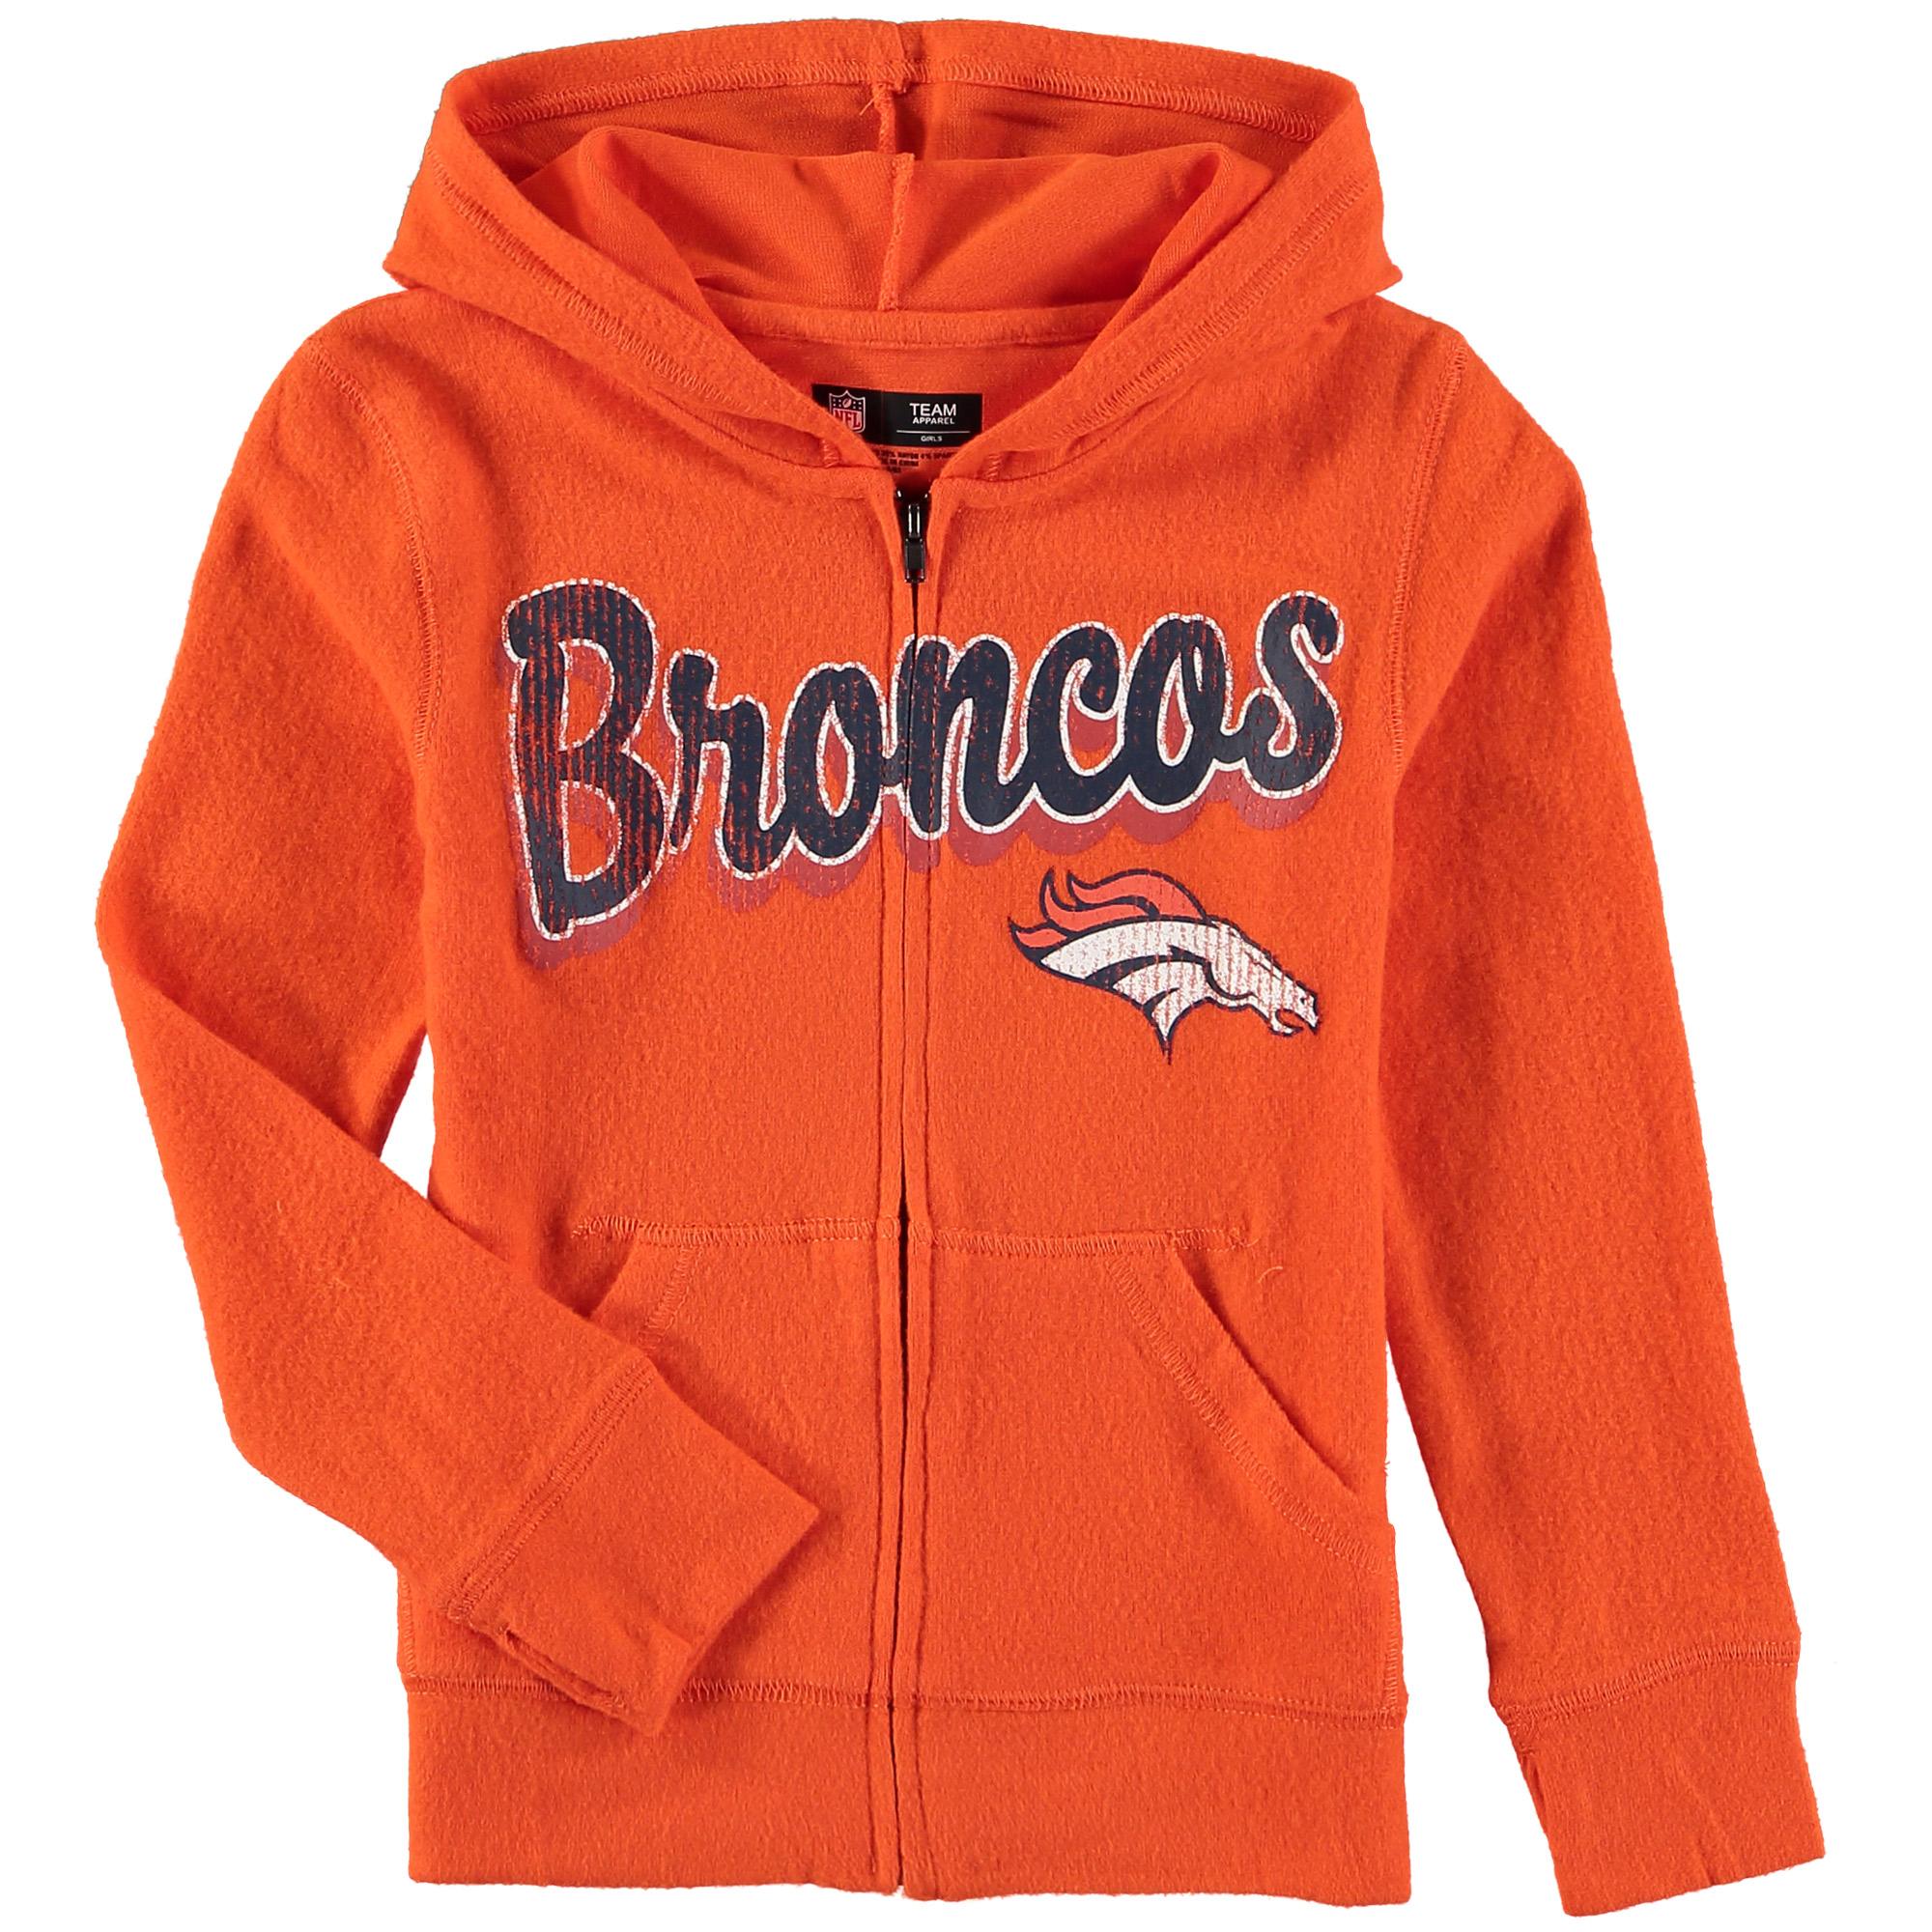 Denver Broncos 5th & Ocean by New Era Girls Youth Brushed Knit Tri-Blend Full-Zip Hoodie - Orange